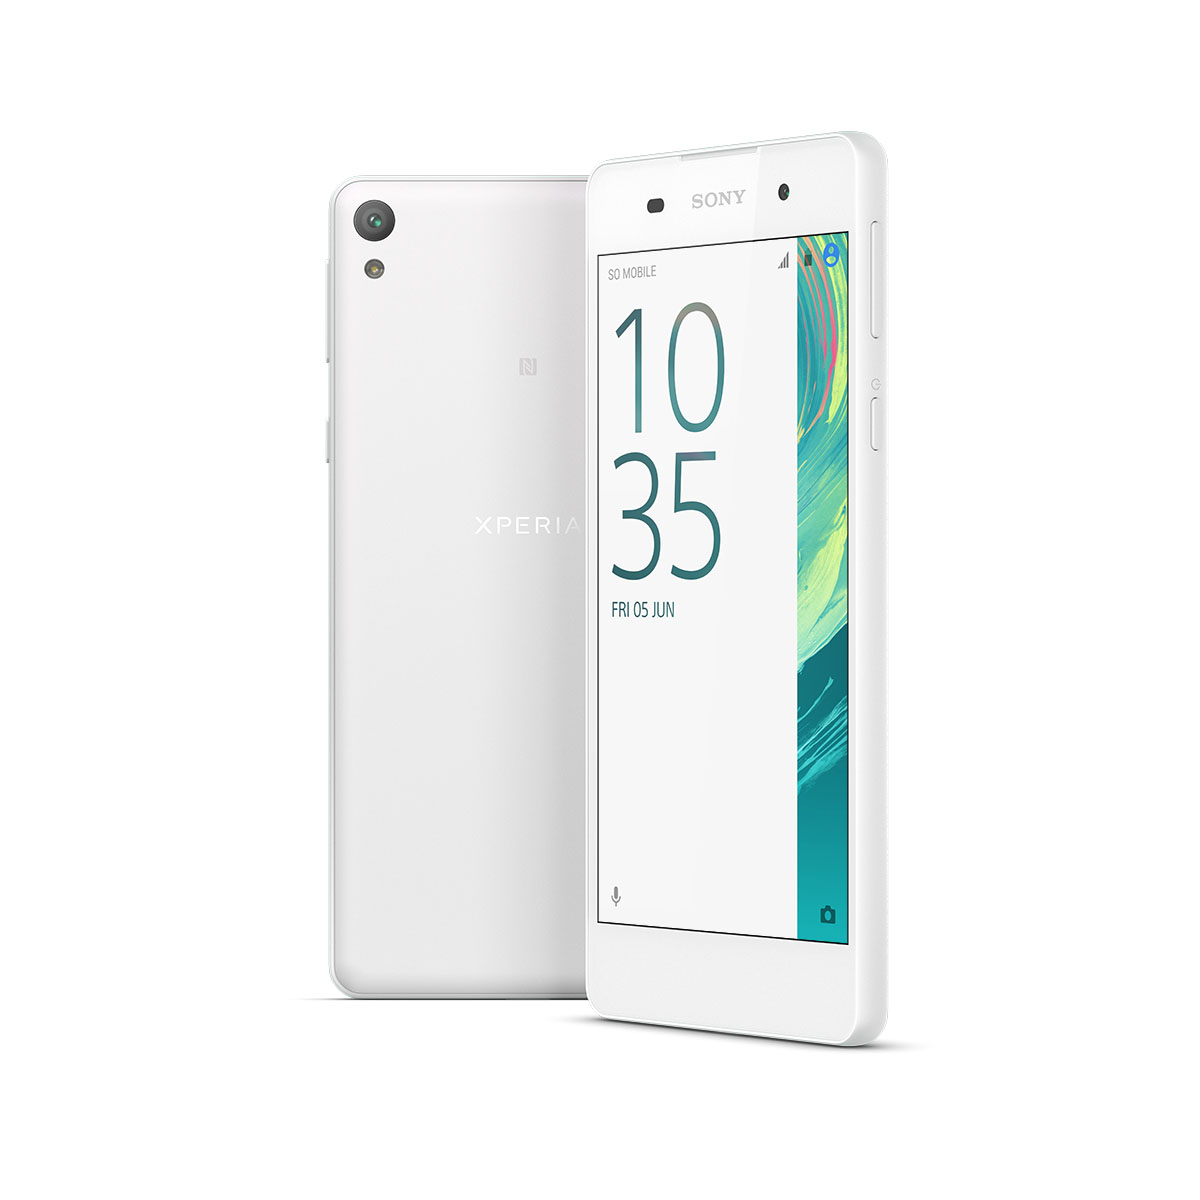 Celular Amigo Kit Telcel Sony Xperia E5 Blanco + Soporte Magnetico